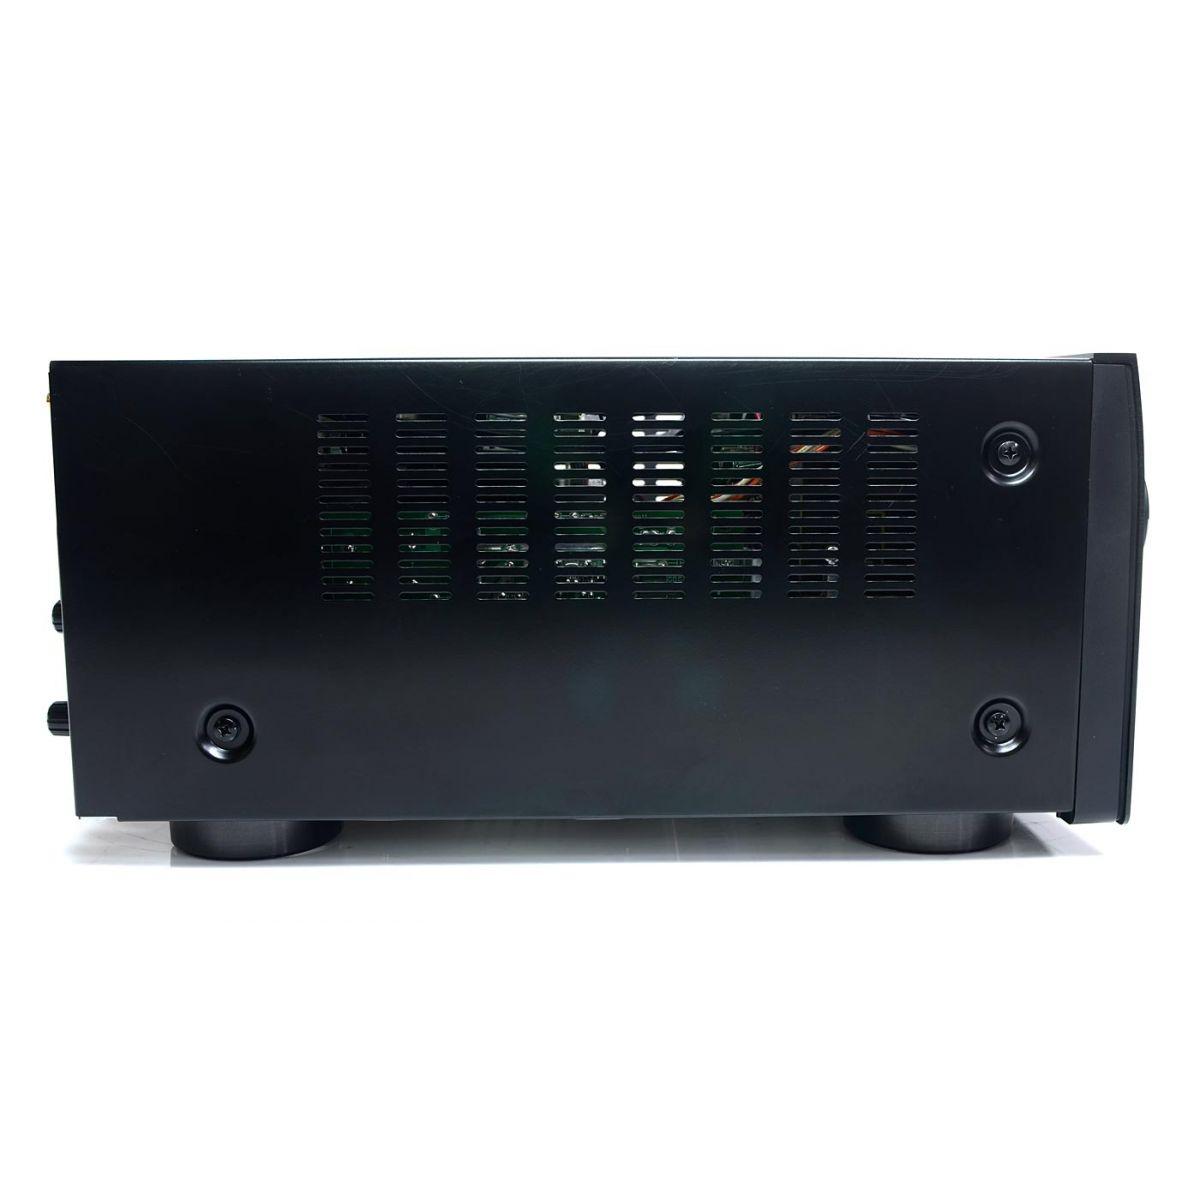 OLD - Receiver Denon AVR-X4100W 7.2 Canais 4K Ultra HD Bluetooth WiFi HDMI v2.0 USB Phono In - OLD